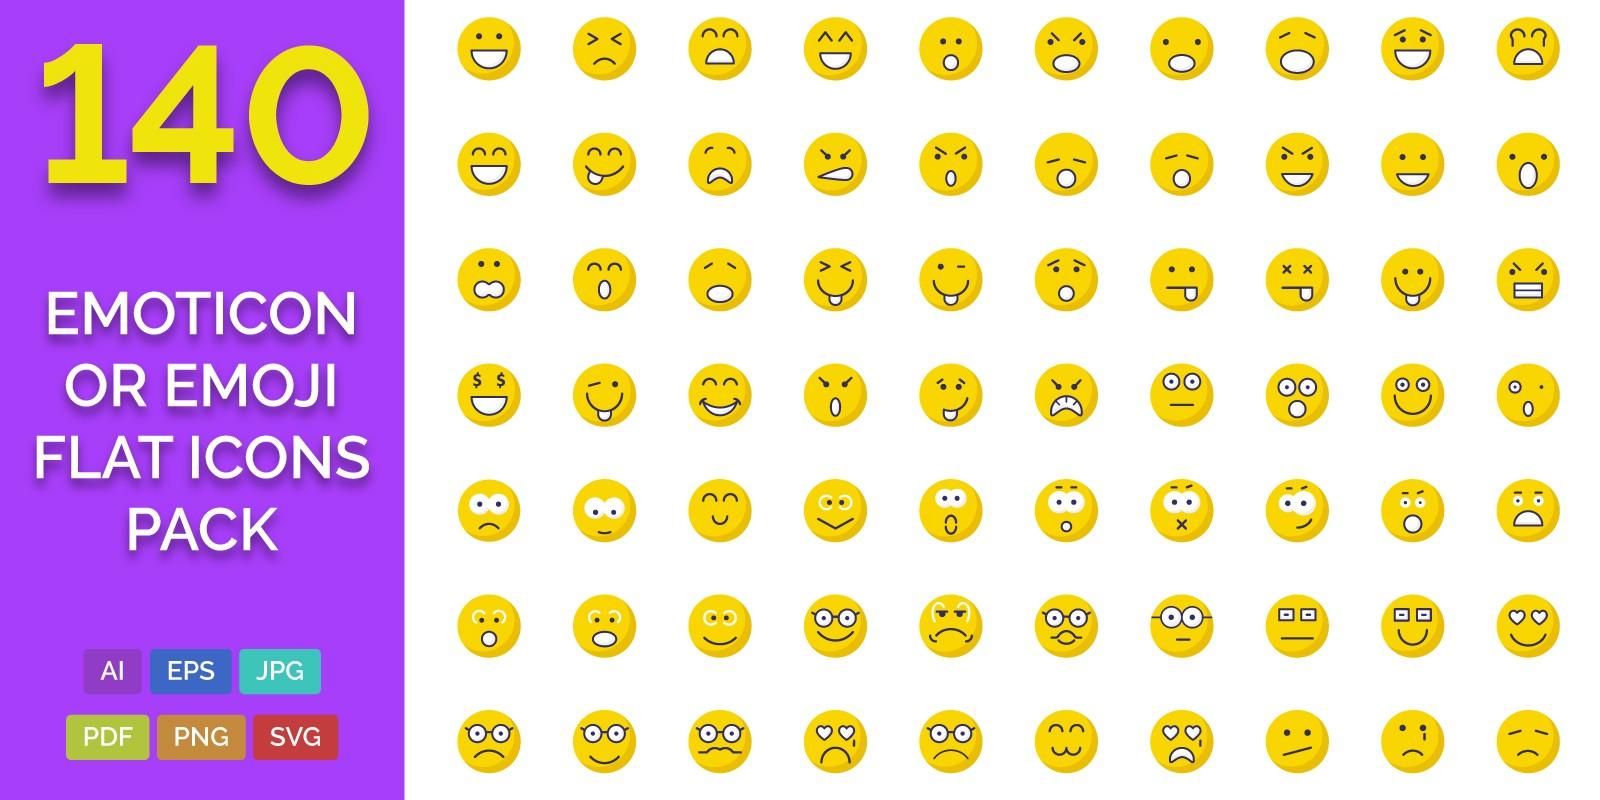 140 Emoticon or Emoji Flat Icons Pack